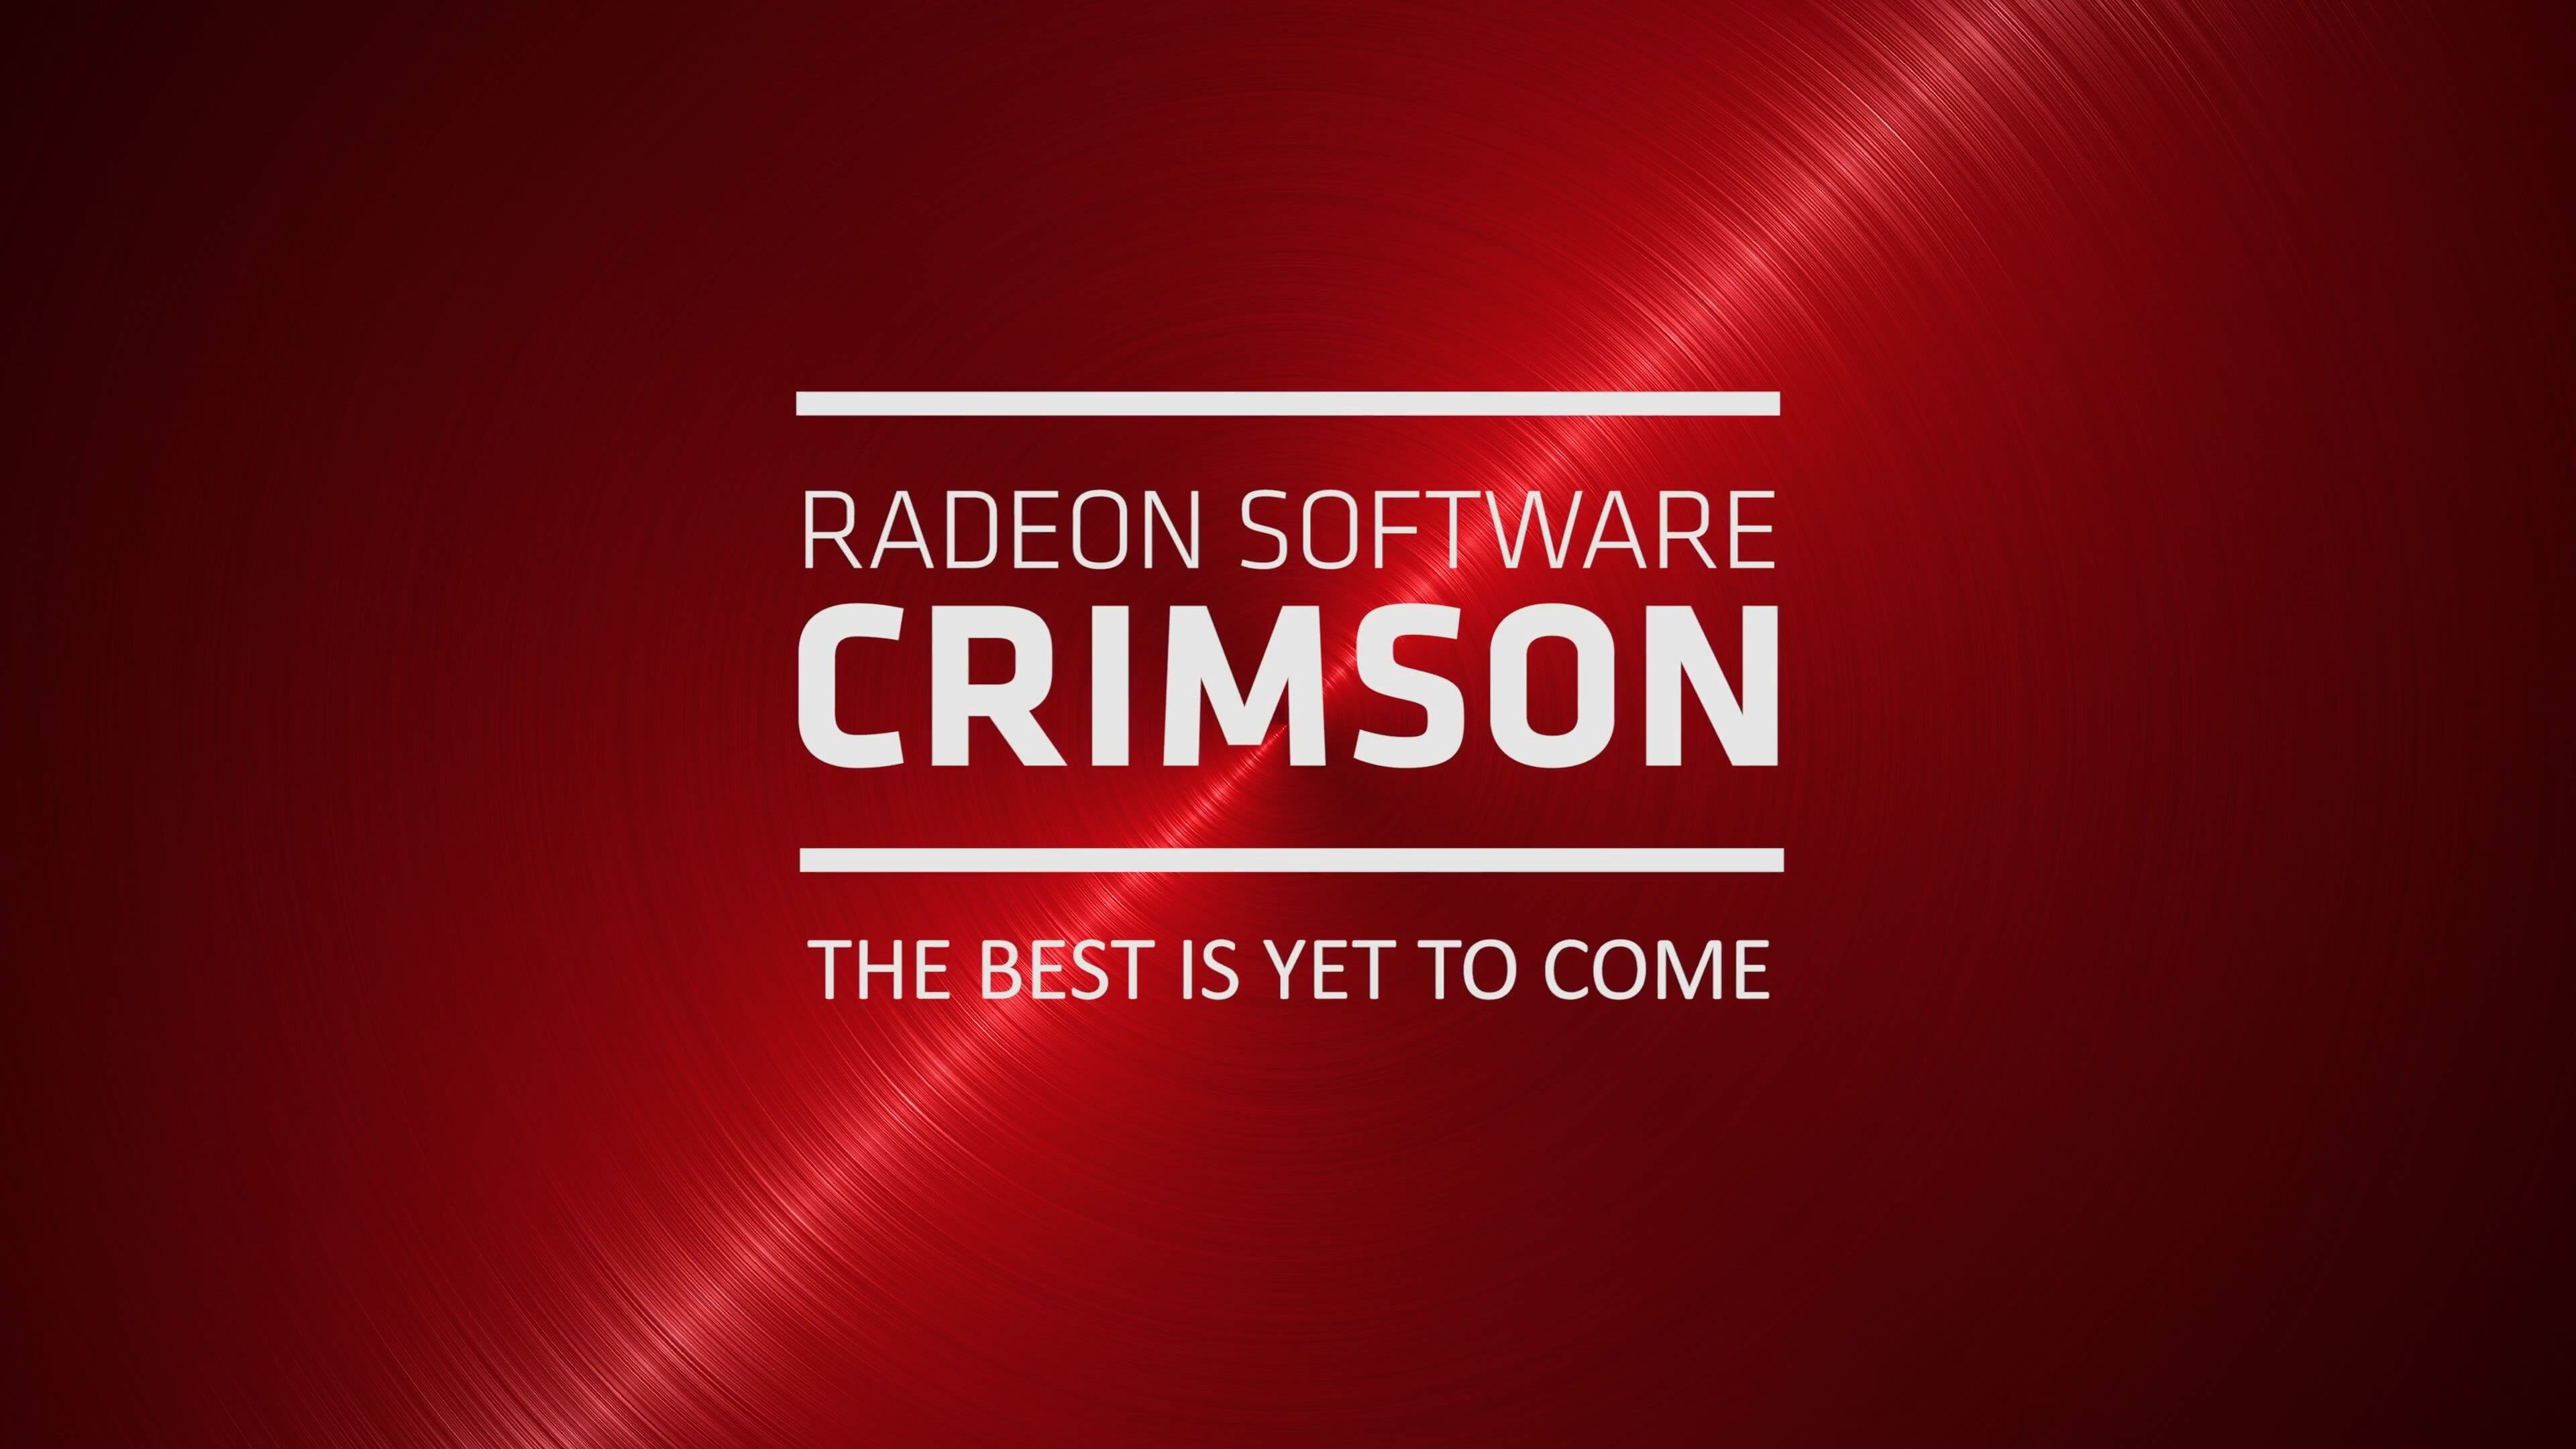 RIP AMD Catalyst, welcome Radeon Software : Crimson Edition 25